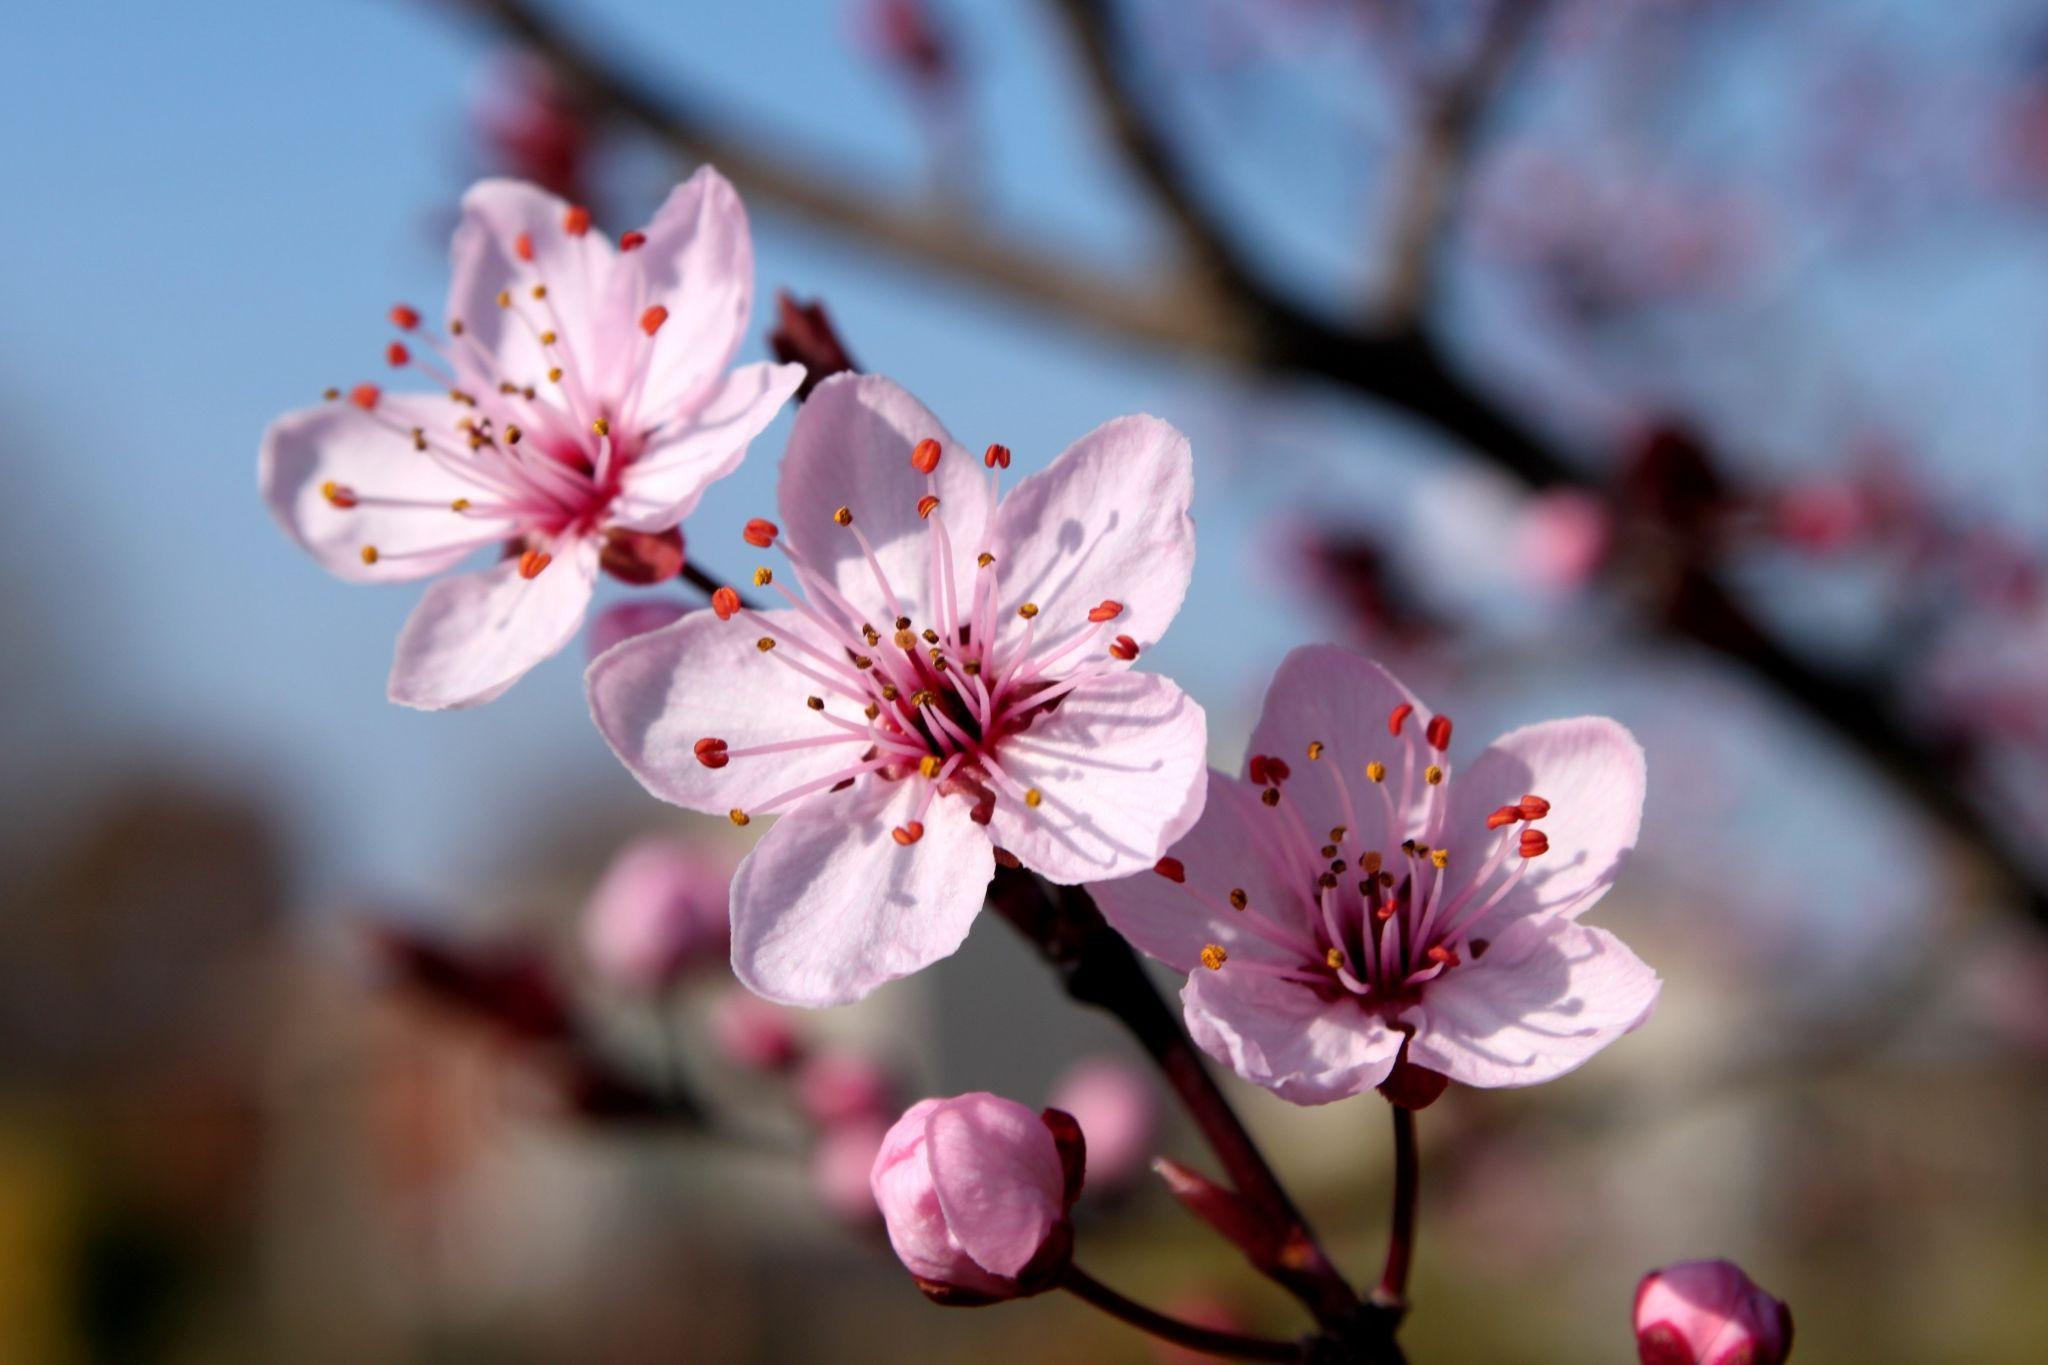 Blossum Song Beautiful Flowers Sakura Cherry Blossom Blossom Flower